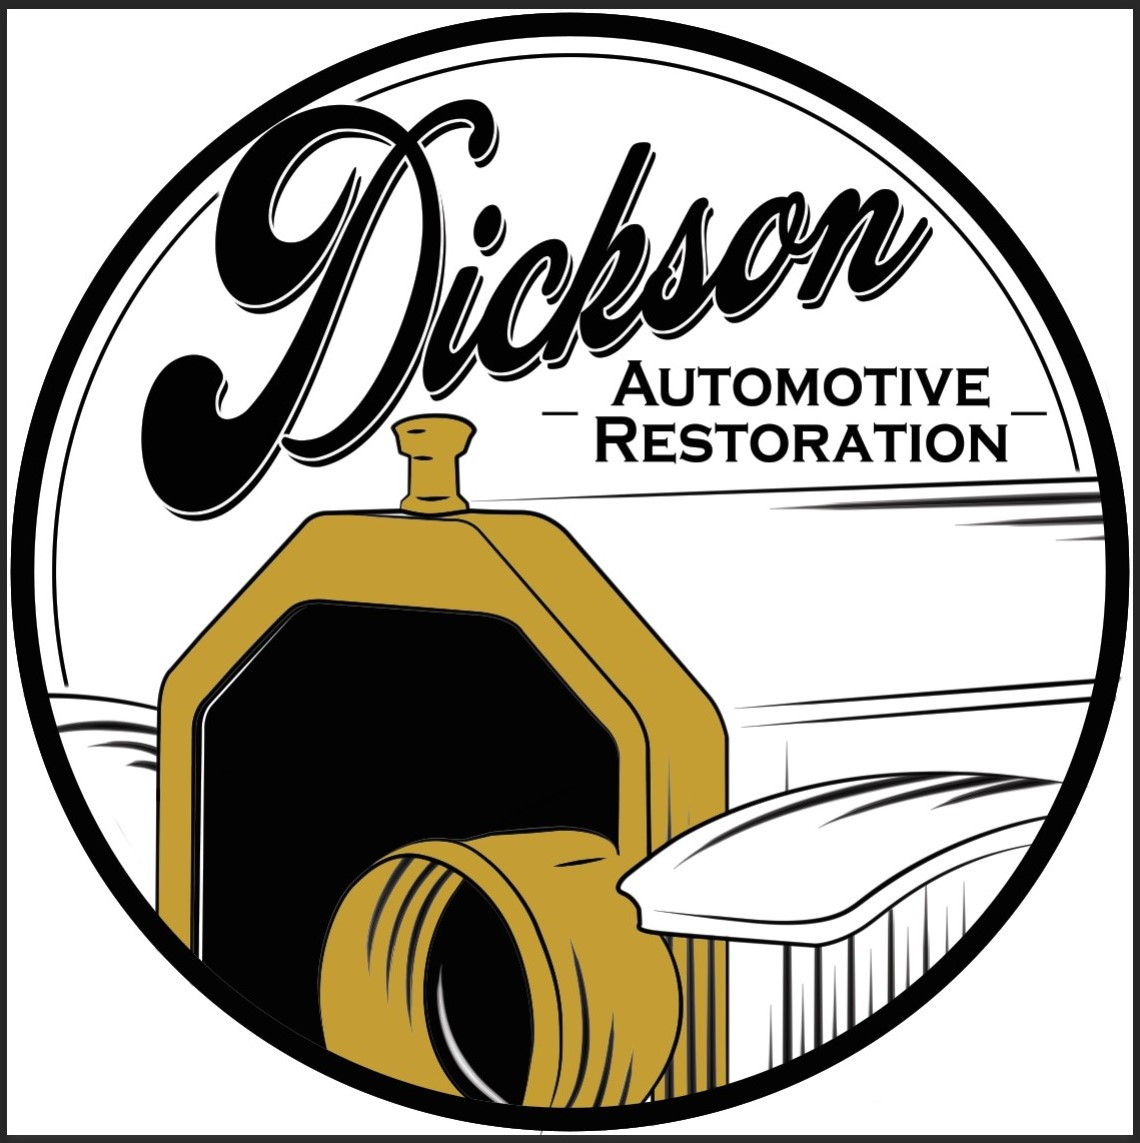 Dickson Automotive Restoration